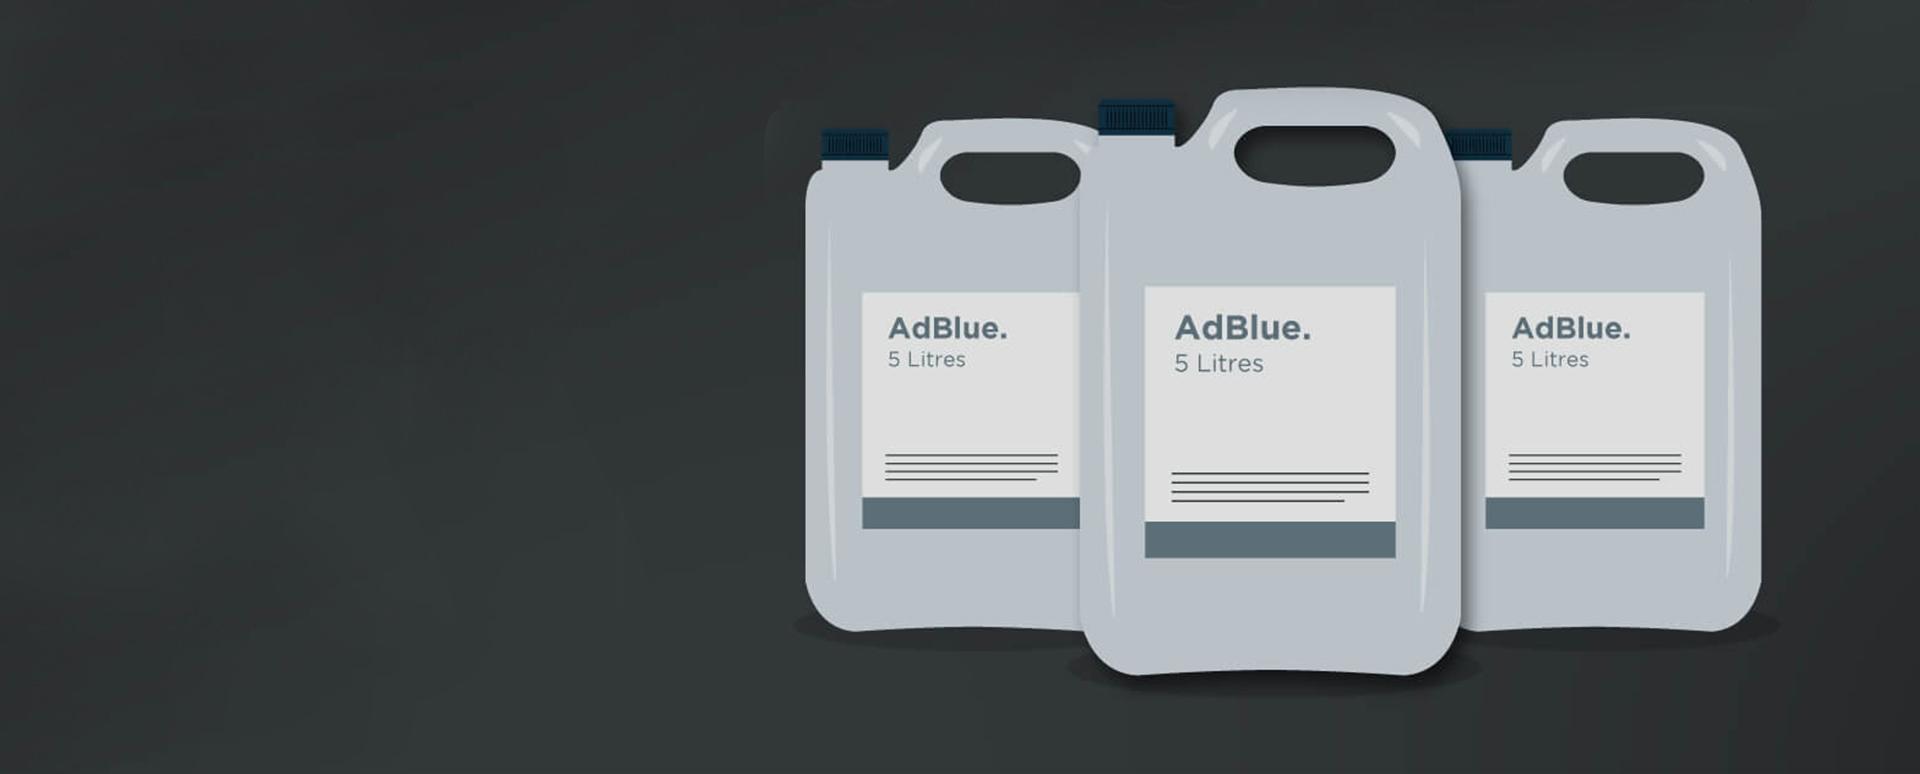 AdBlue Bottles graphic